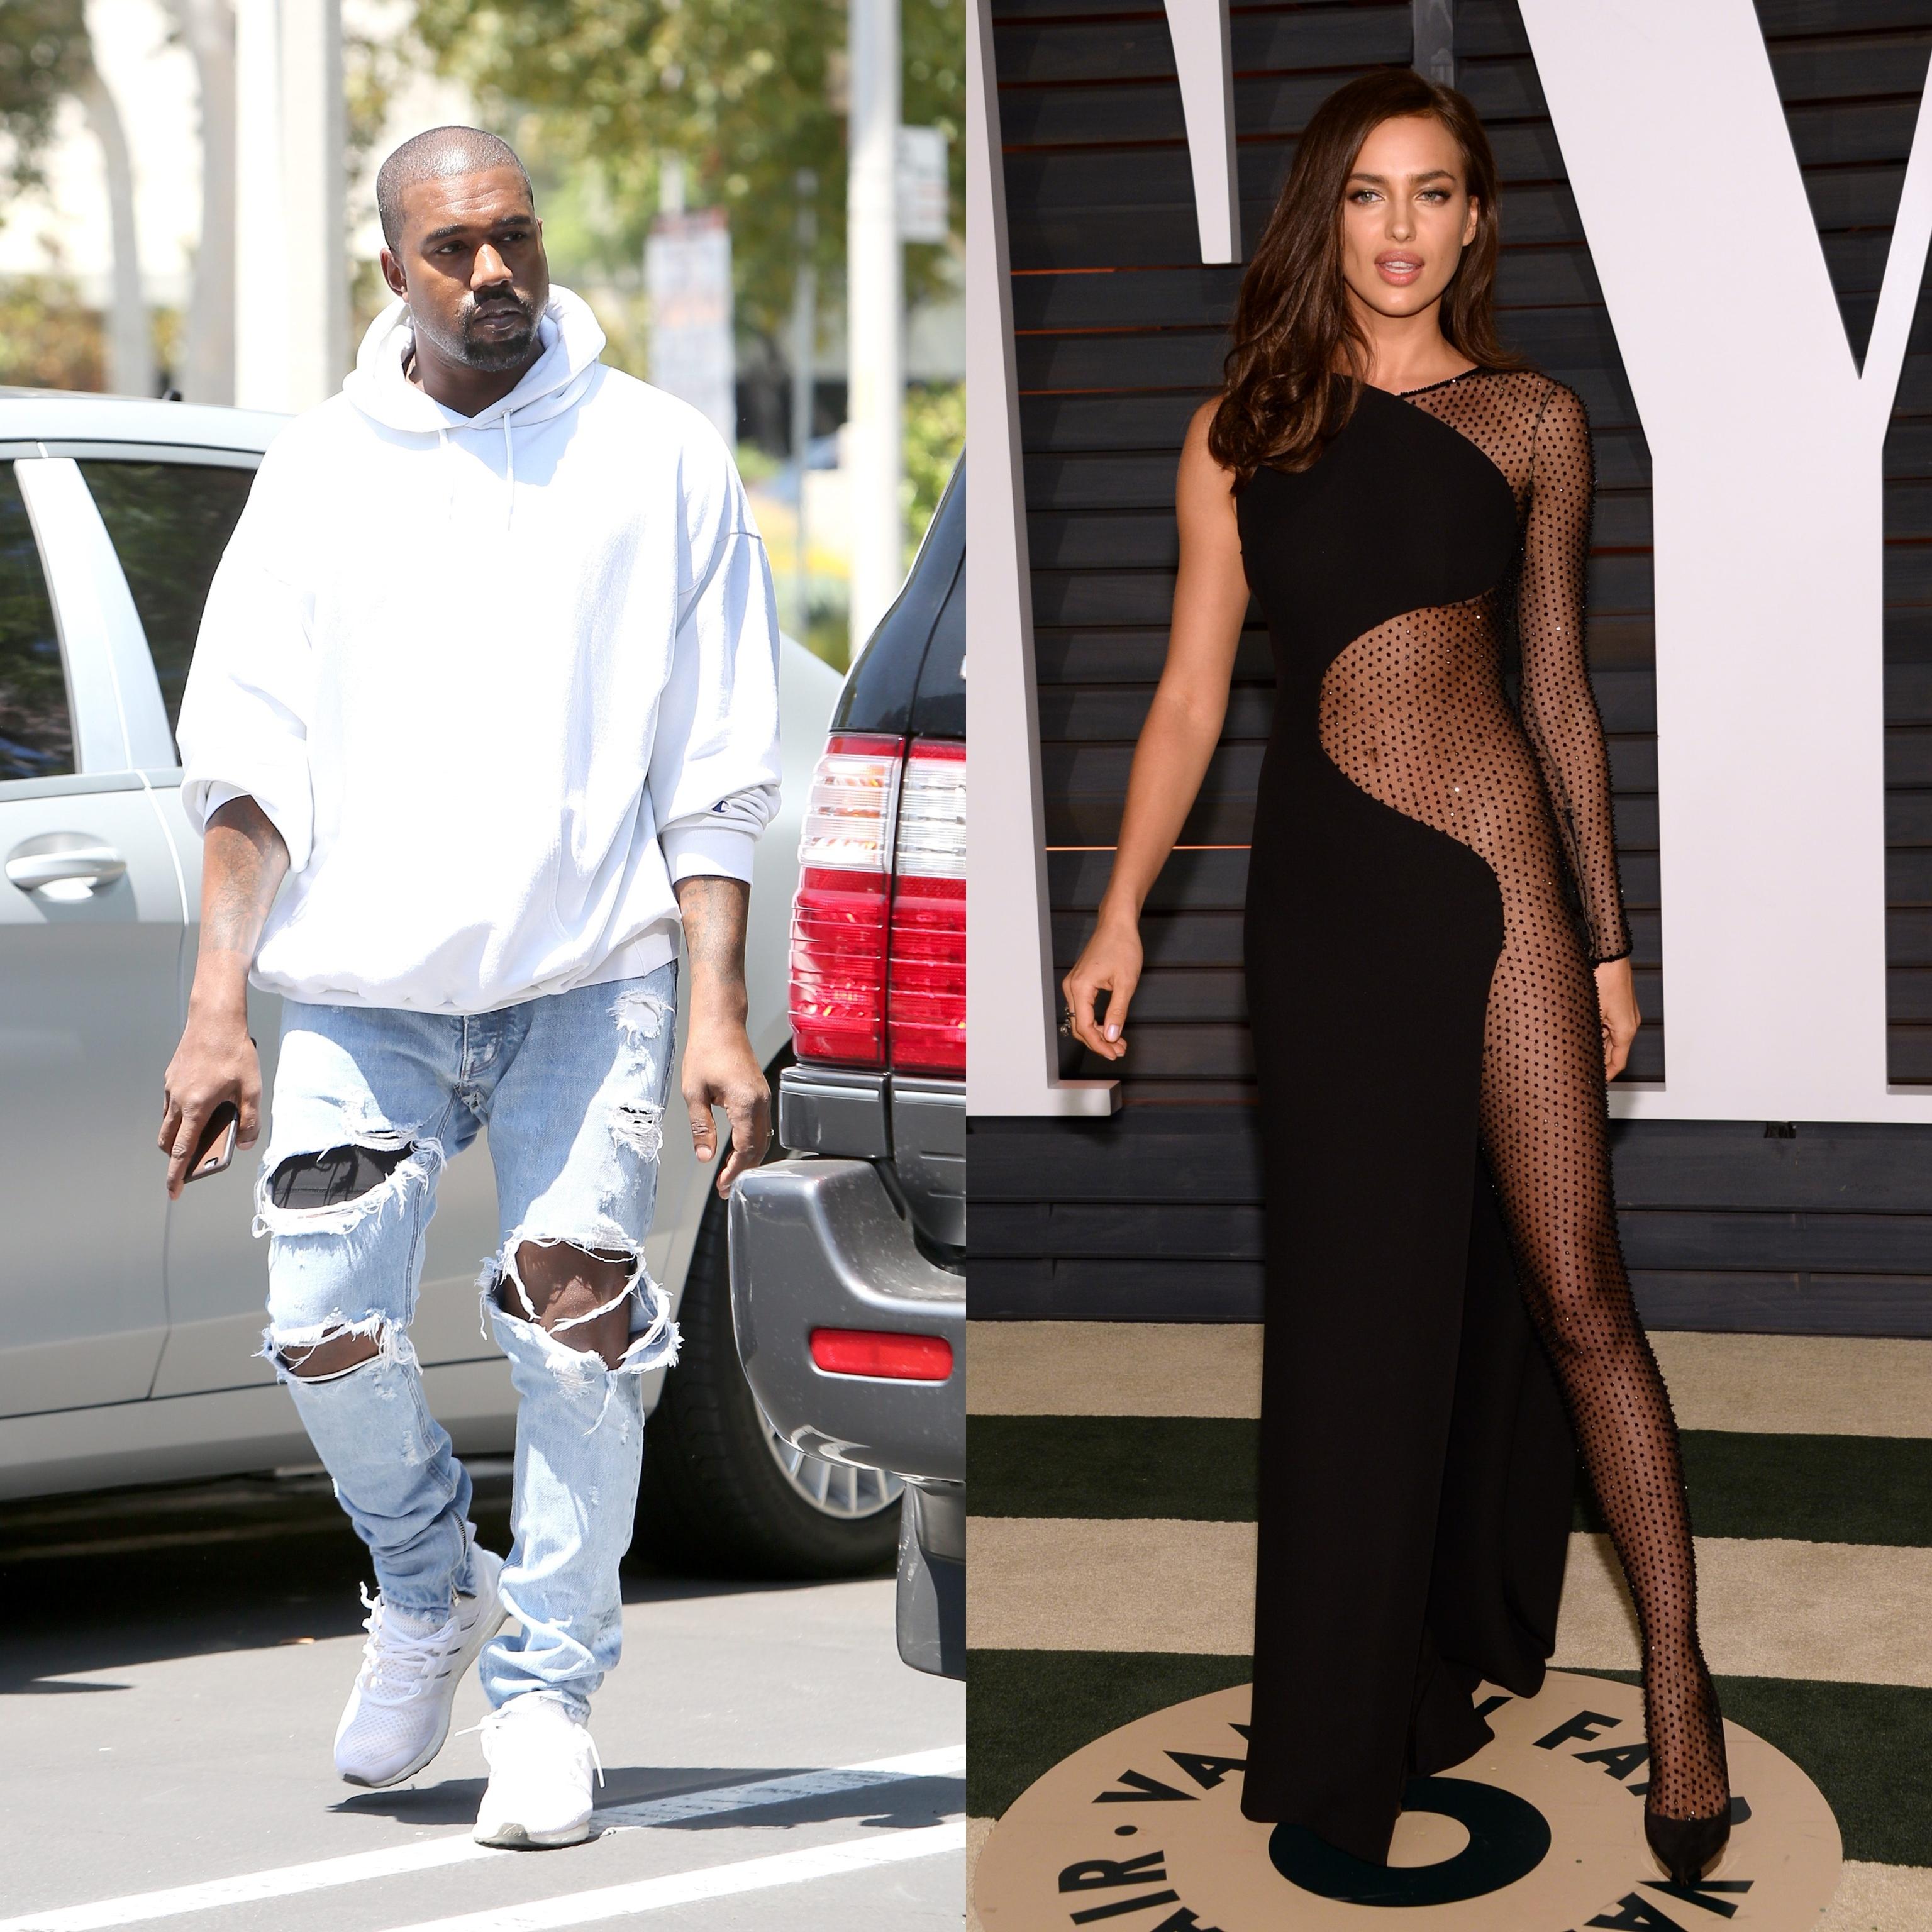 El rapero Kanye West y la modelo Irina Shayk.